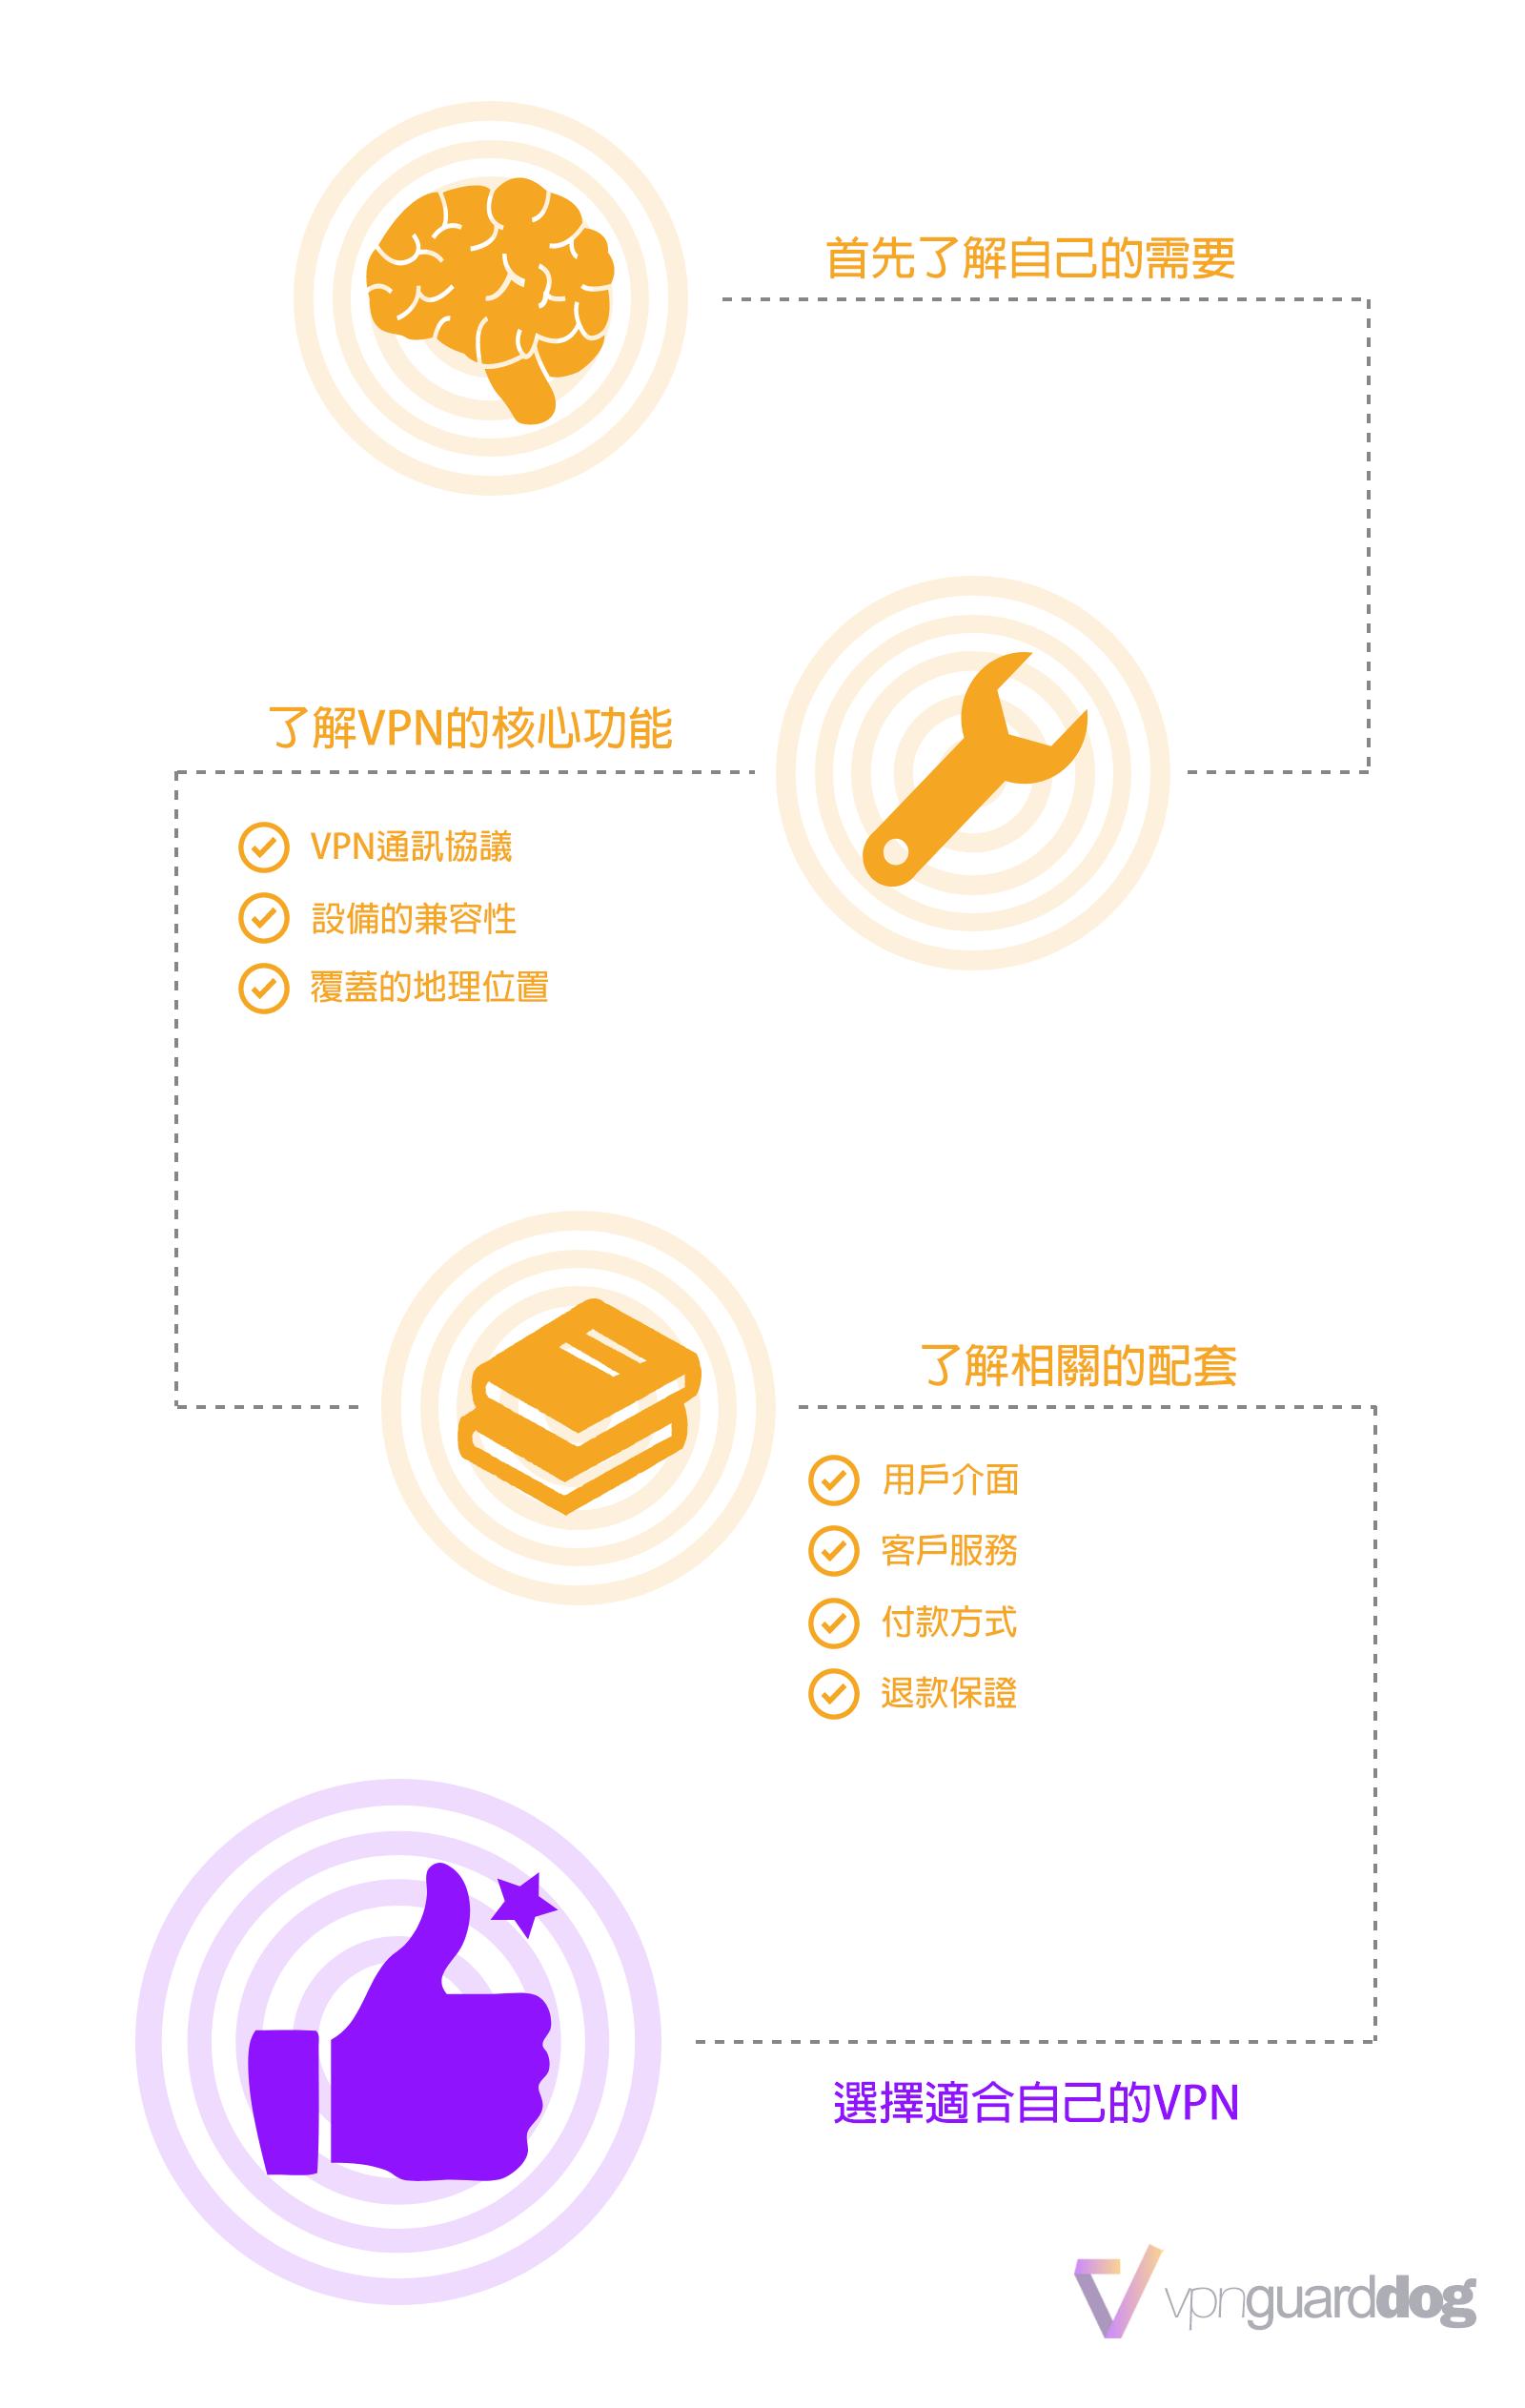 VPN選擇方法